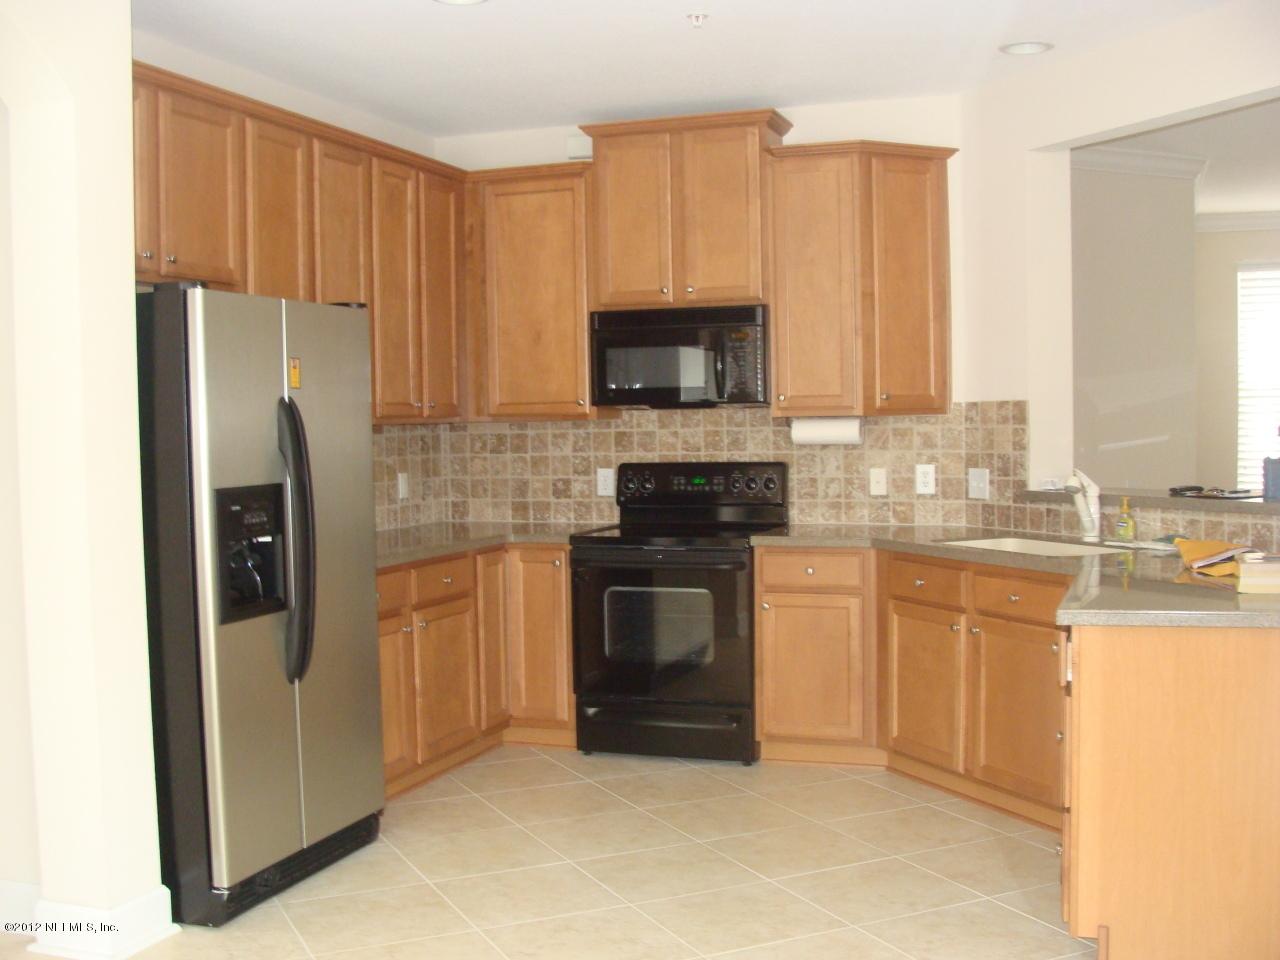 4480 DEERWOOD LAKE, JACKSONVILLE, FLORIDA 32216, 3 Bedrooms Bedrooms, ,2 BathroomsBathrooms,Rental,For Rent,DEERWOOD LAKE,1077930